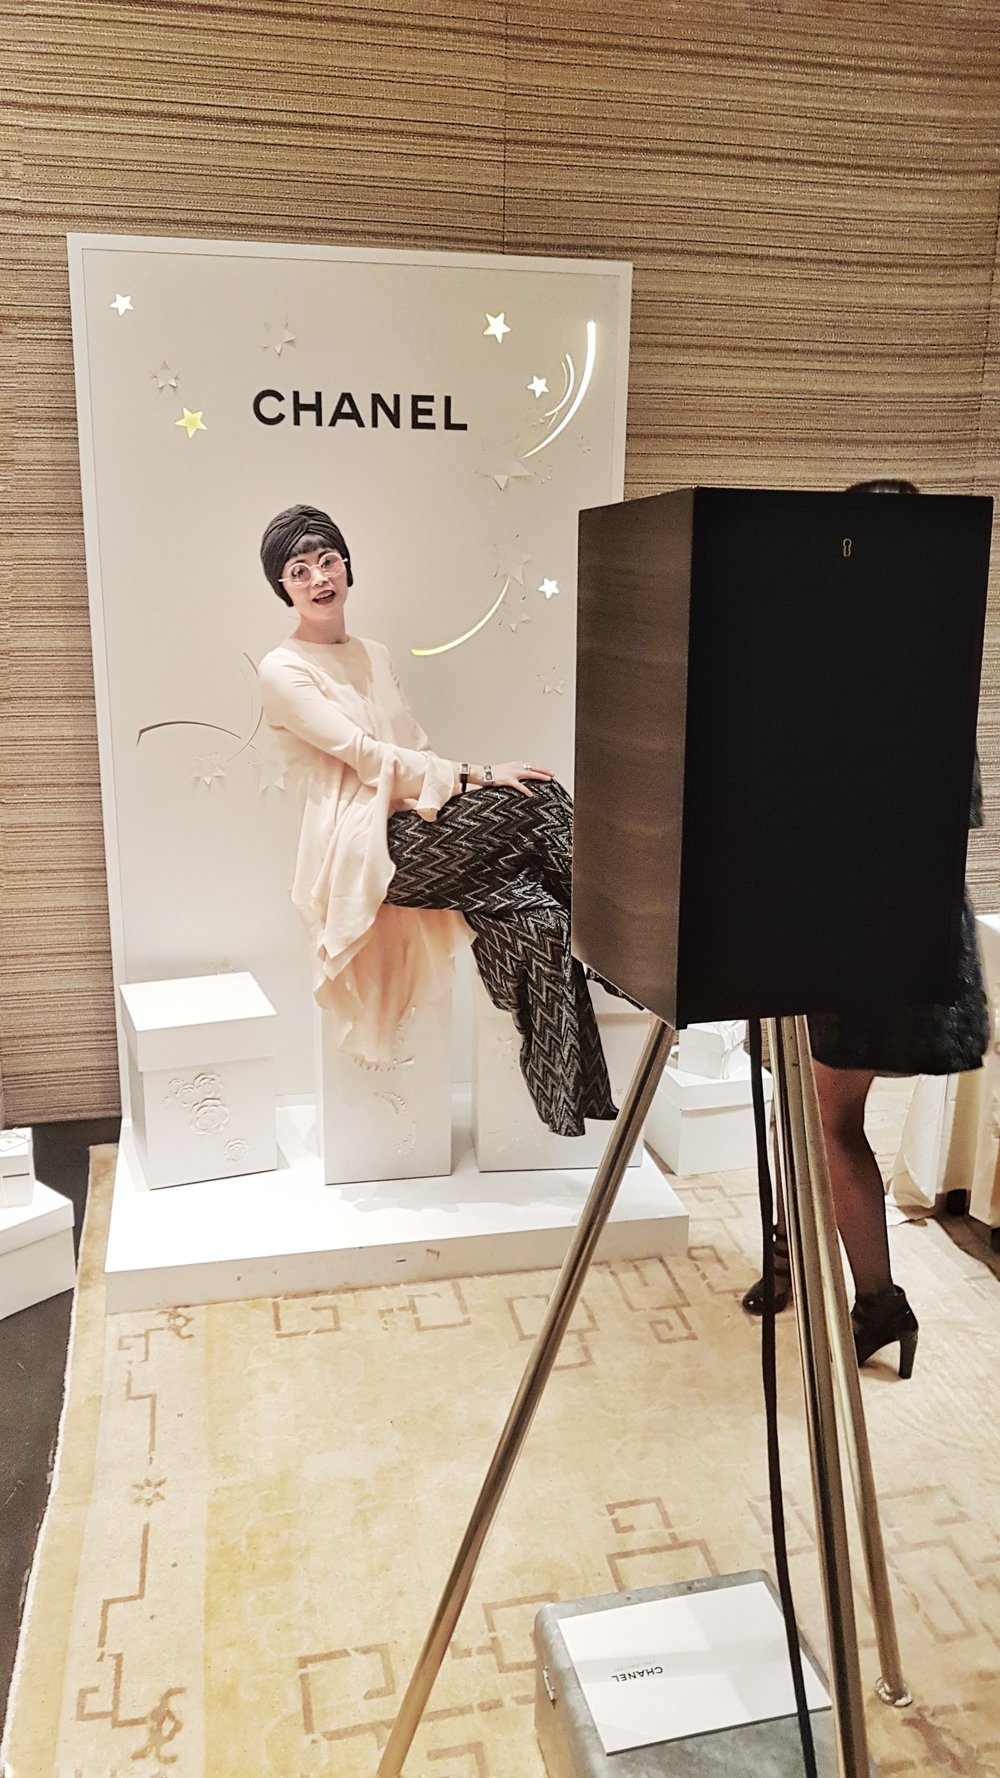 Chanel The London Lightbox Photo Booth New Bond Street